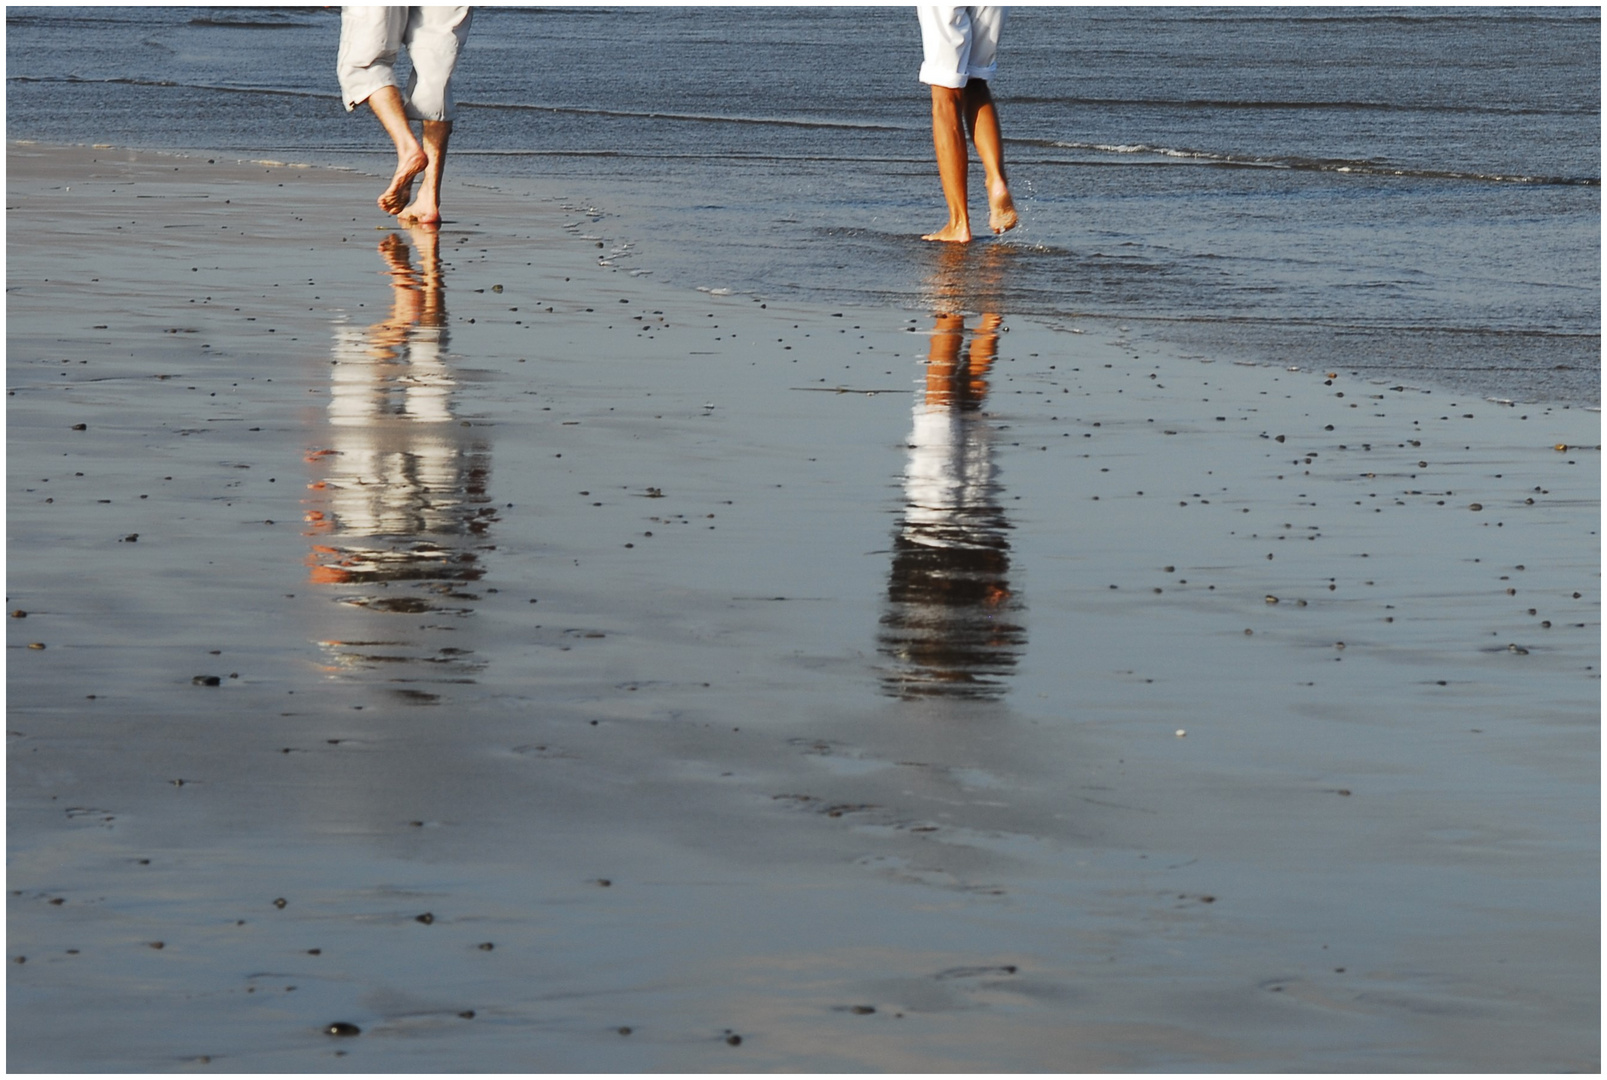 der Spaziergang am Strand........